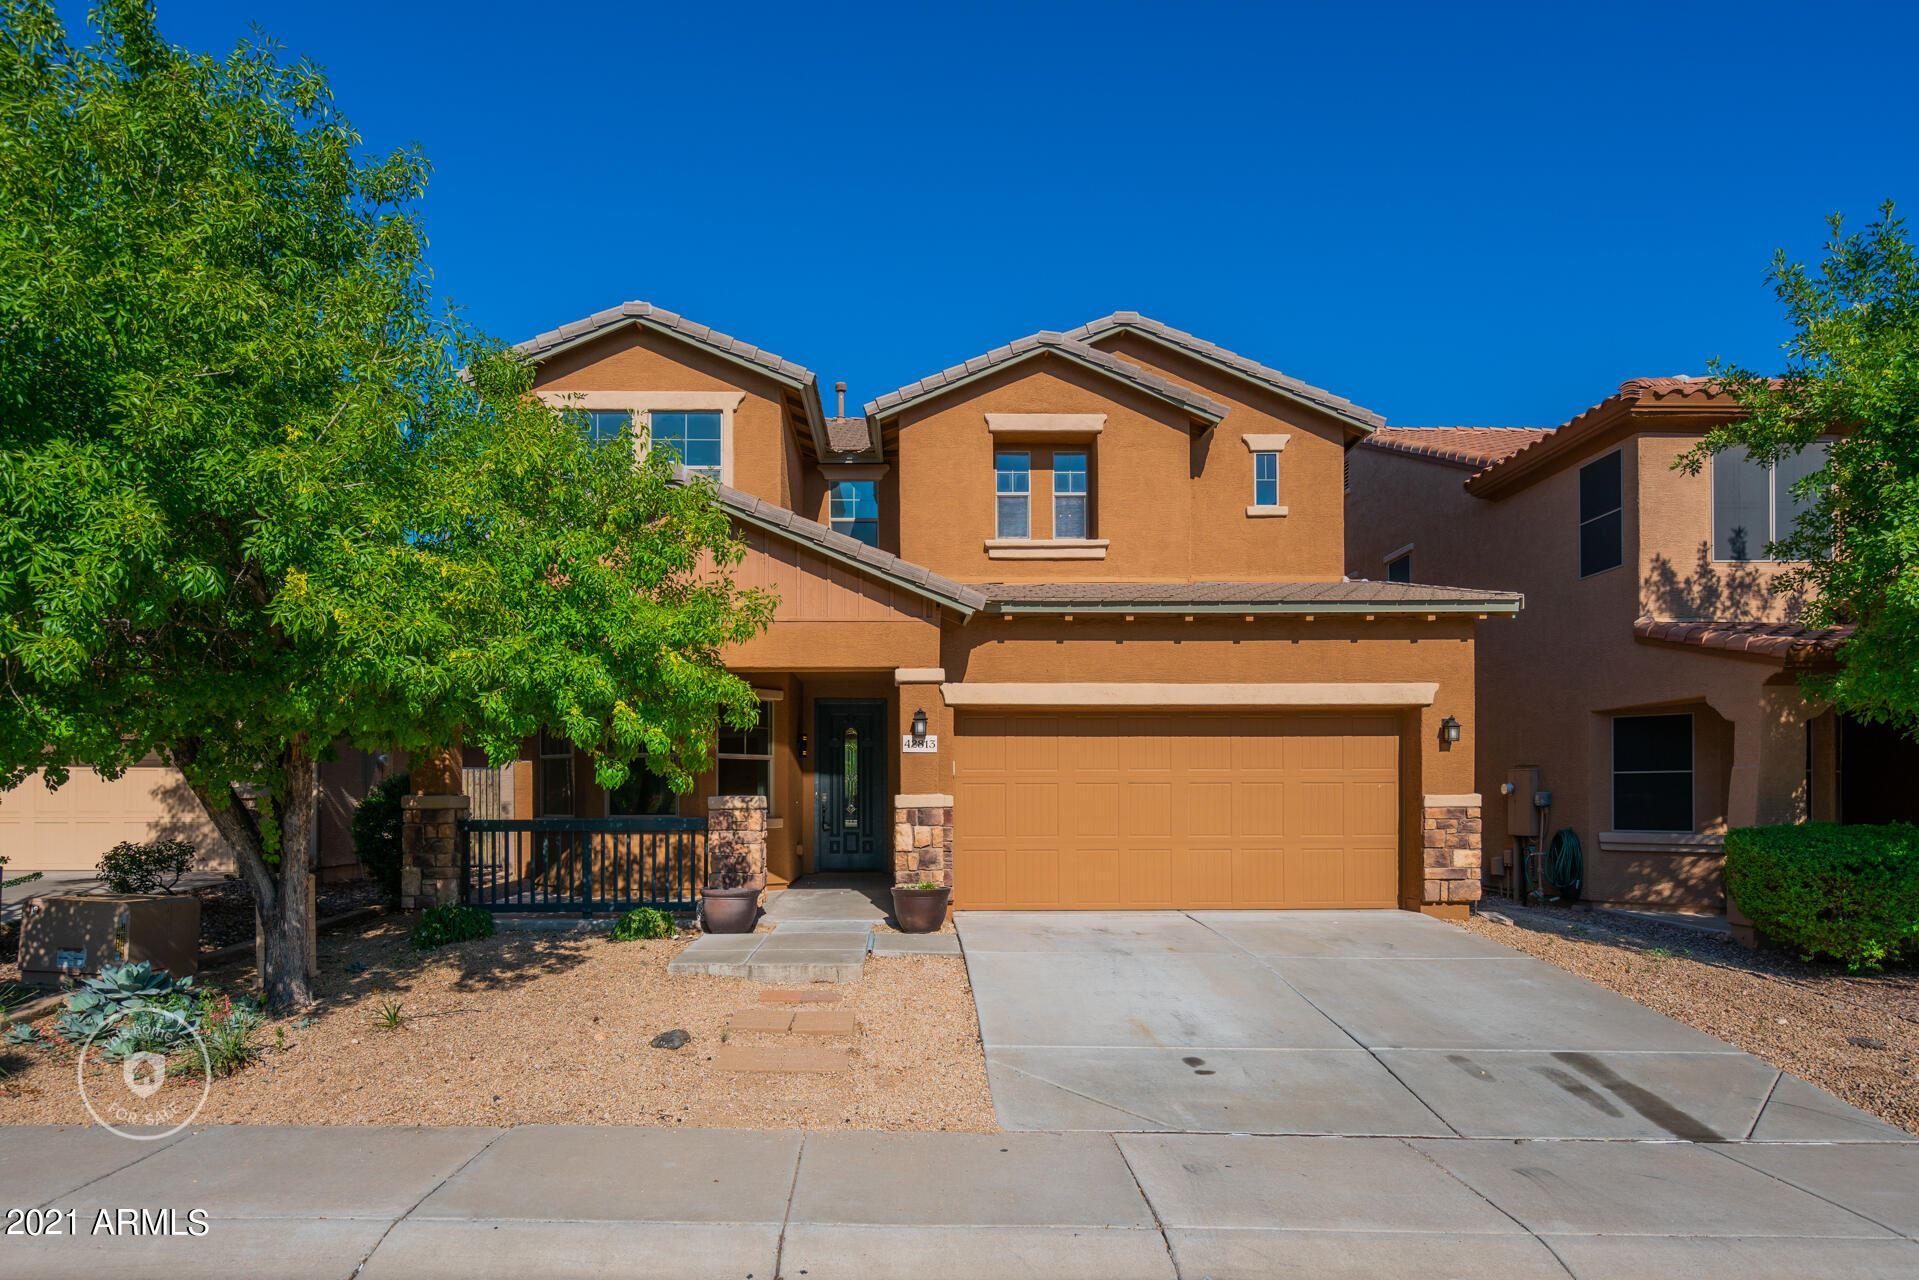 Photo of 42813 N 43RD Drive, New River, AZ 85087 (MLS # 6285918)